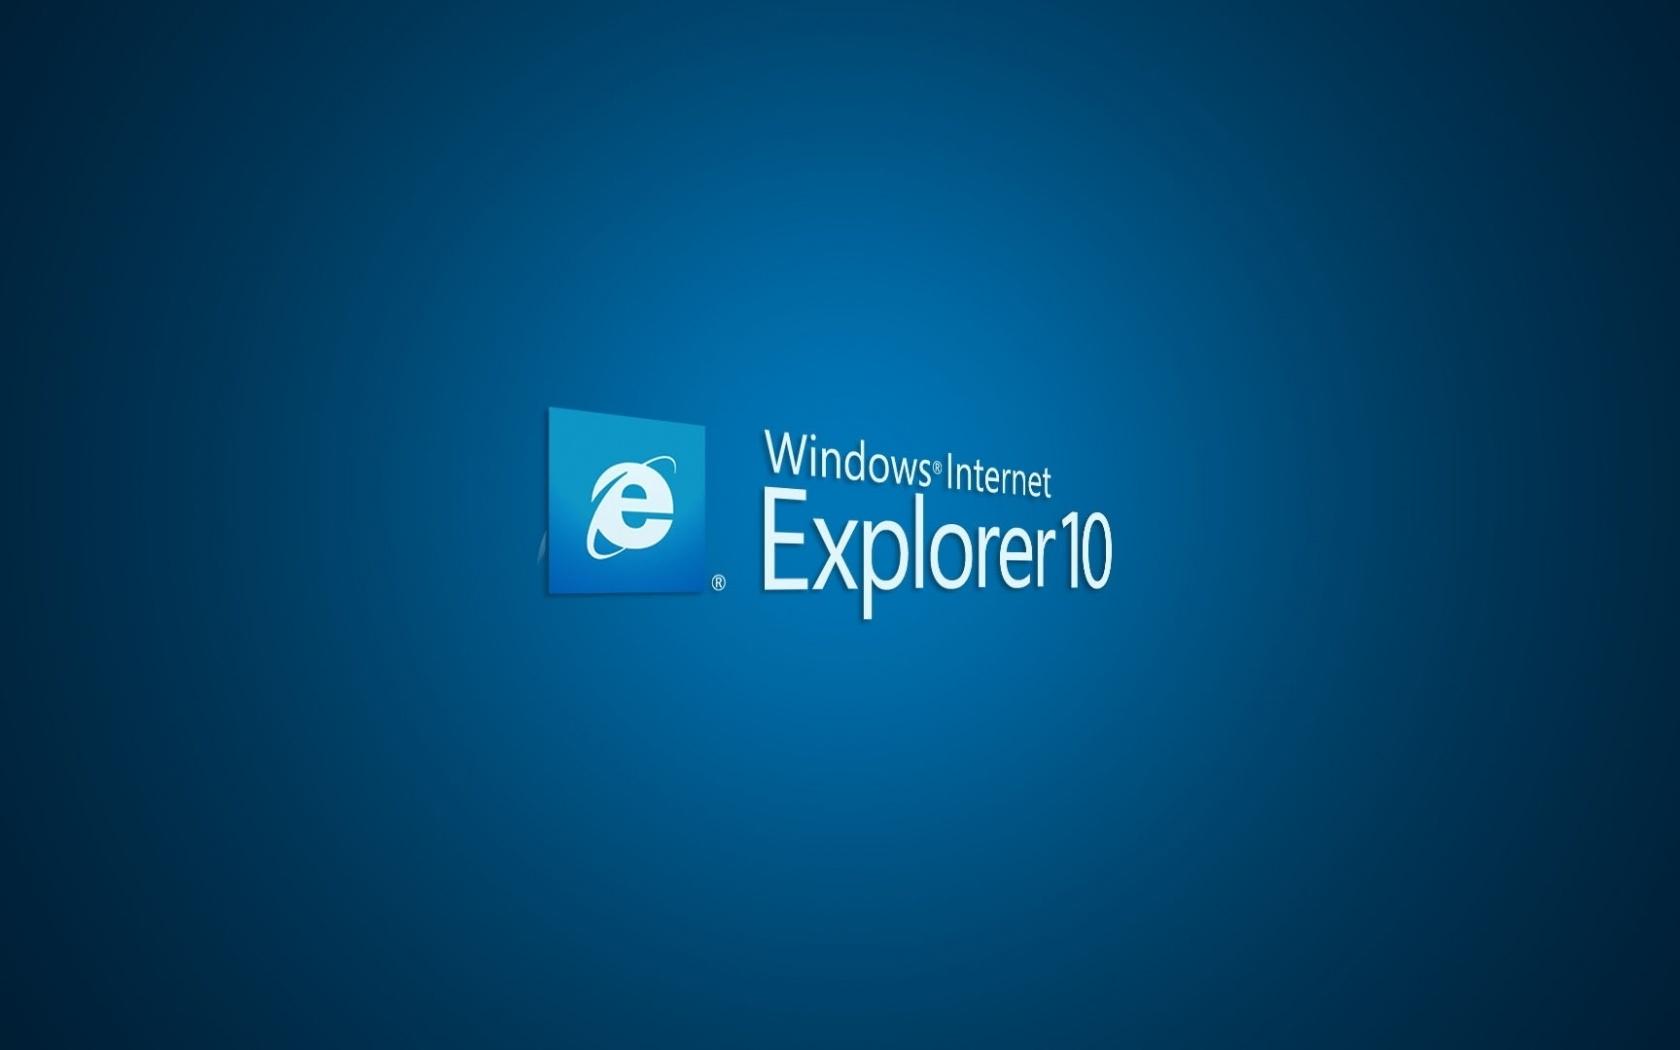 1680x1050 Microsoft Windows Internet Explorer 10 desktop PC and Mac 1680x1050